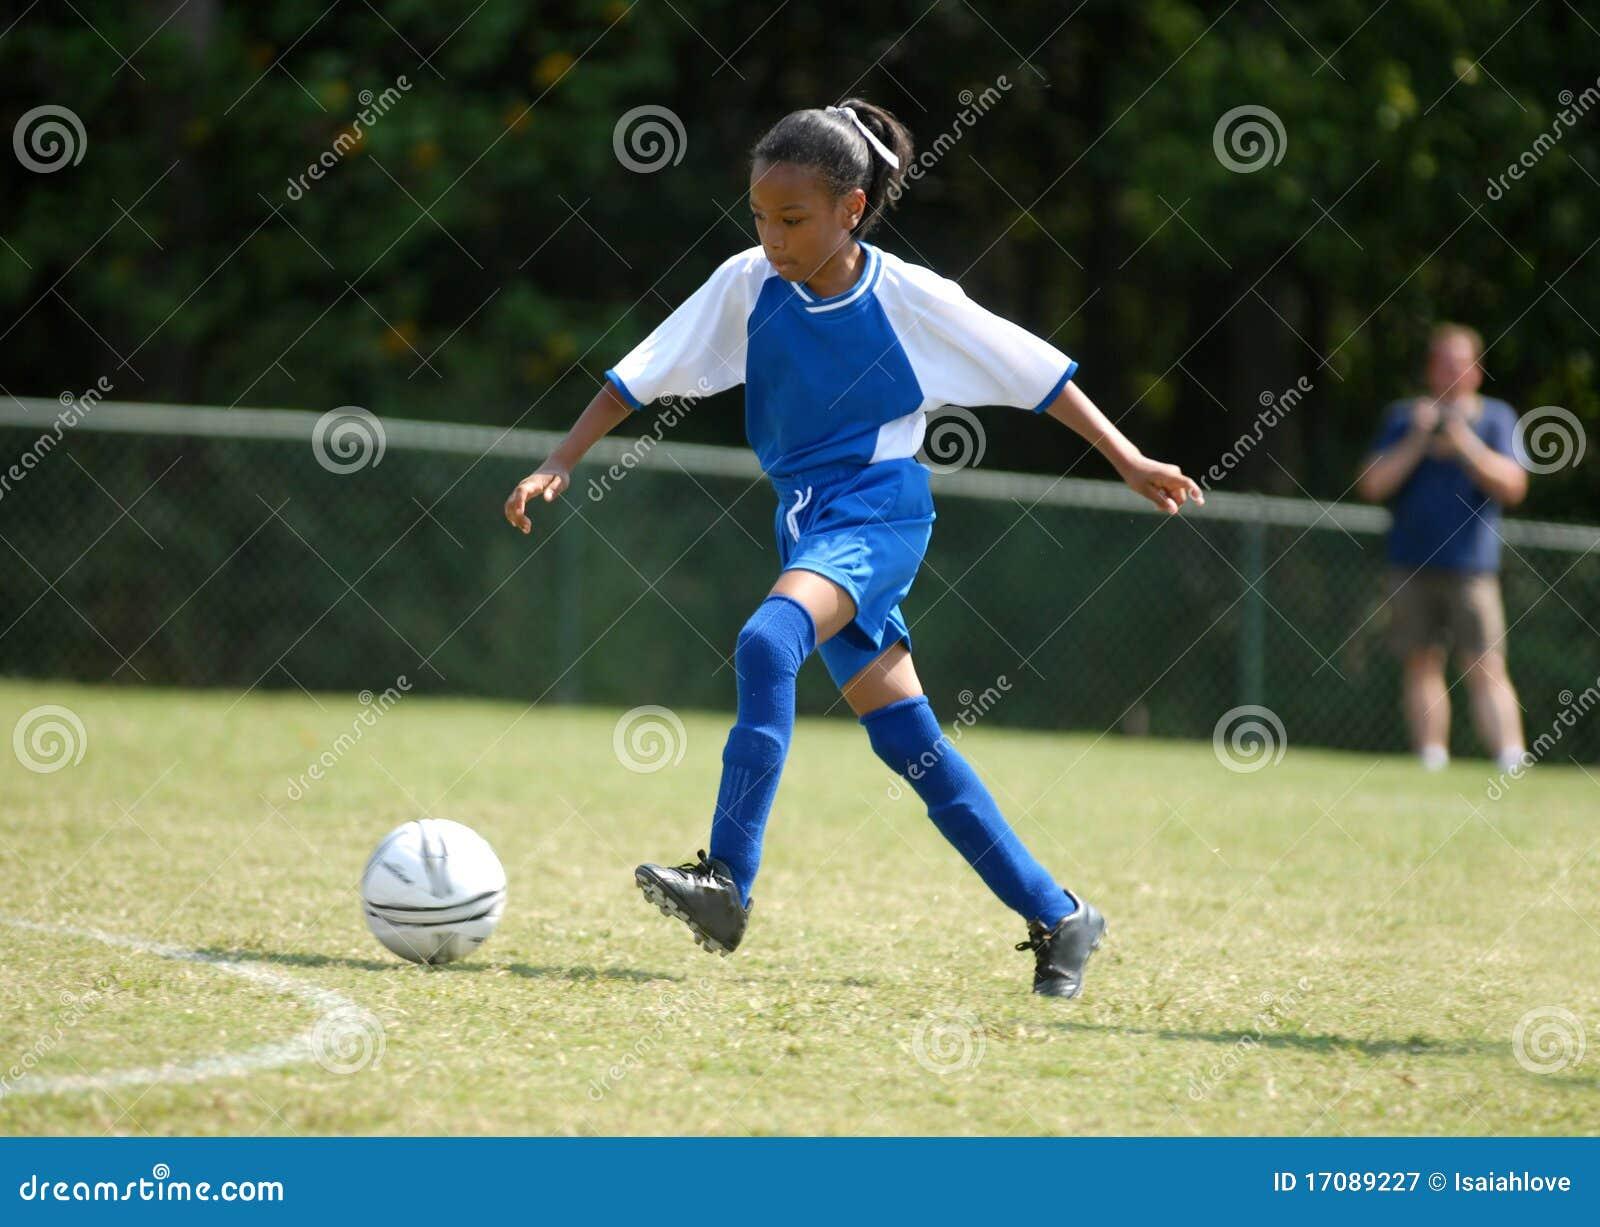 girl playing soccer - HD1300×1014